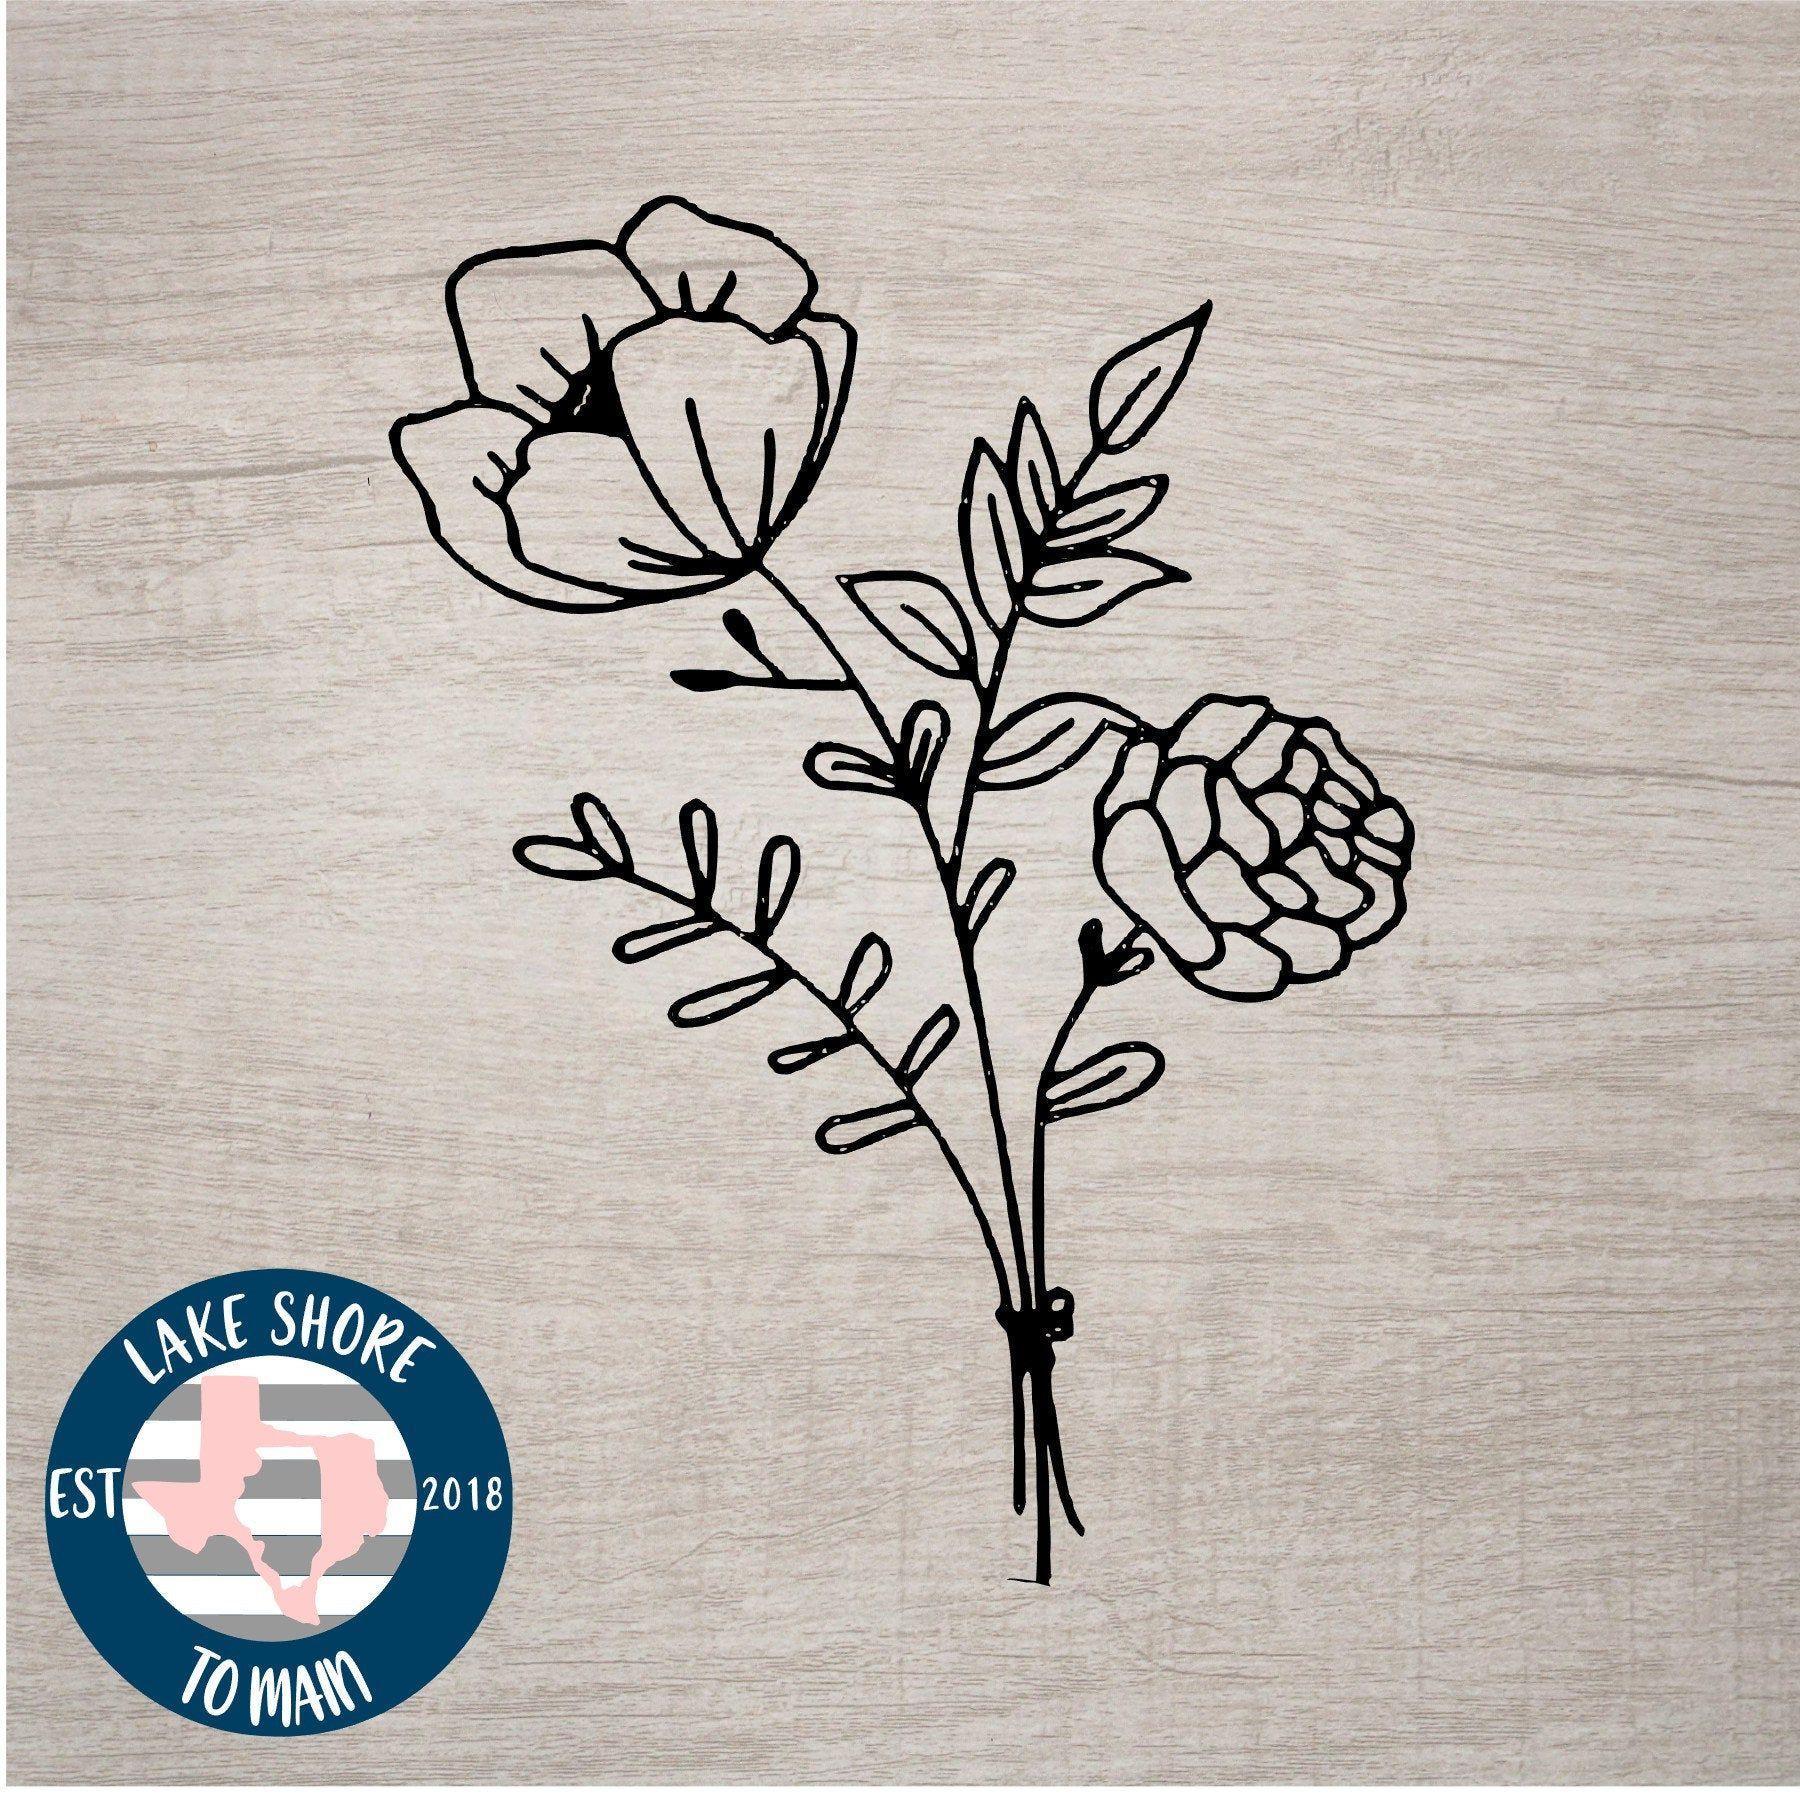 Hibiscus Flower Decal Patterned Vinyl Decal Hibiscus Flower Etsy In 2020 Pattern Decal Patterned Vinyl Vinyl Decals